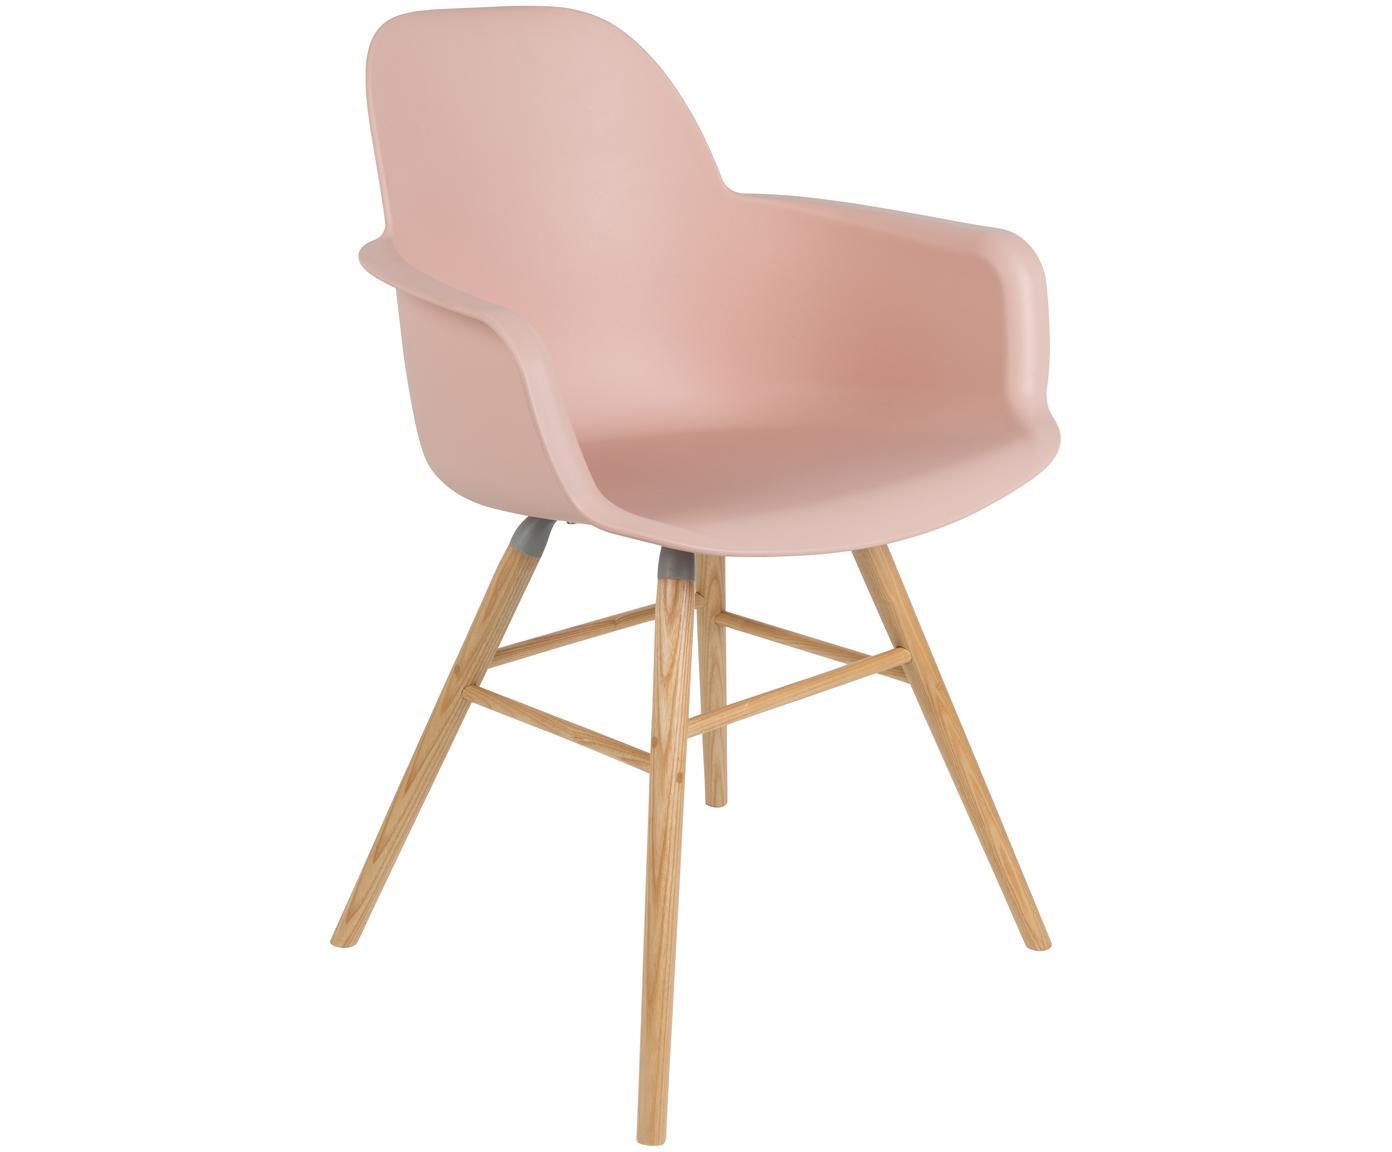 Sedia con braccioli Albert Kuip, Seduta: 100% polipropilene, Piedini: legno di frassino, Rosa, Larg. 59 x Prof. 55 cm